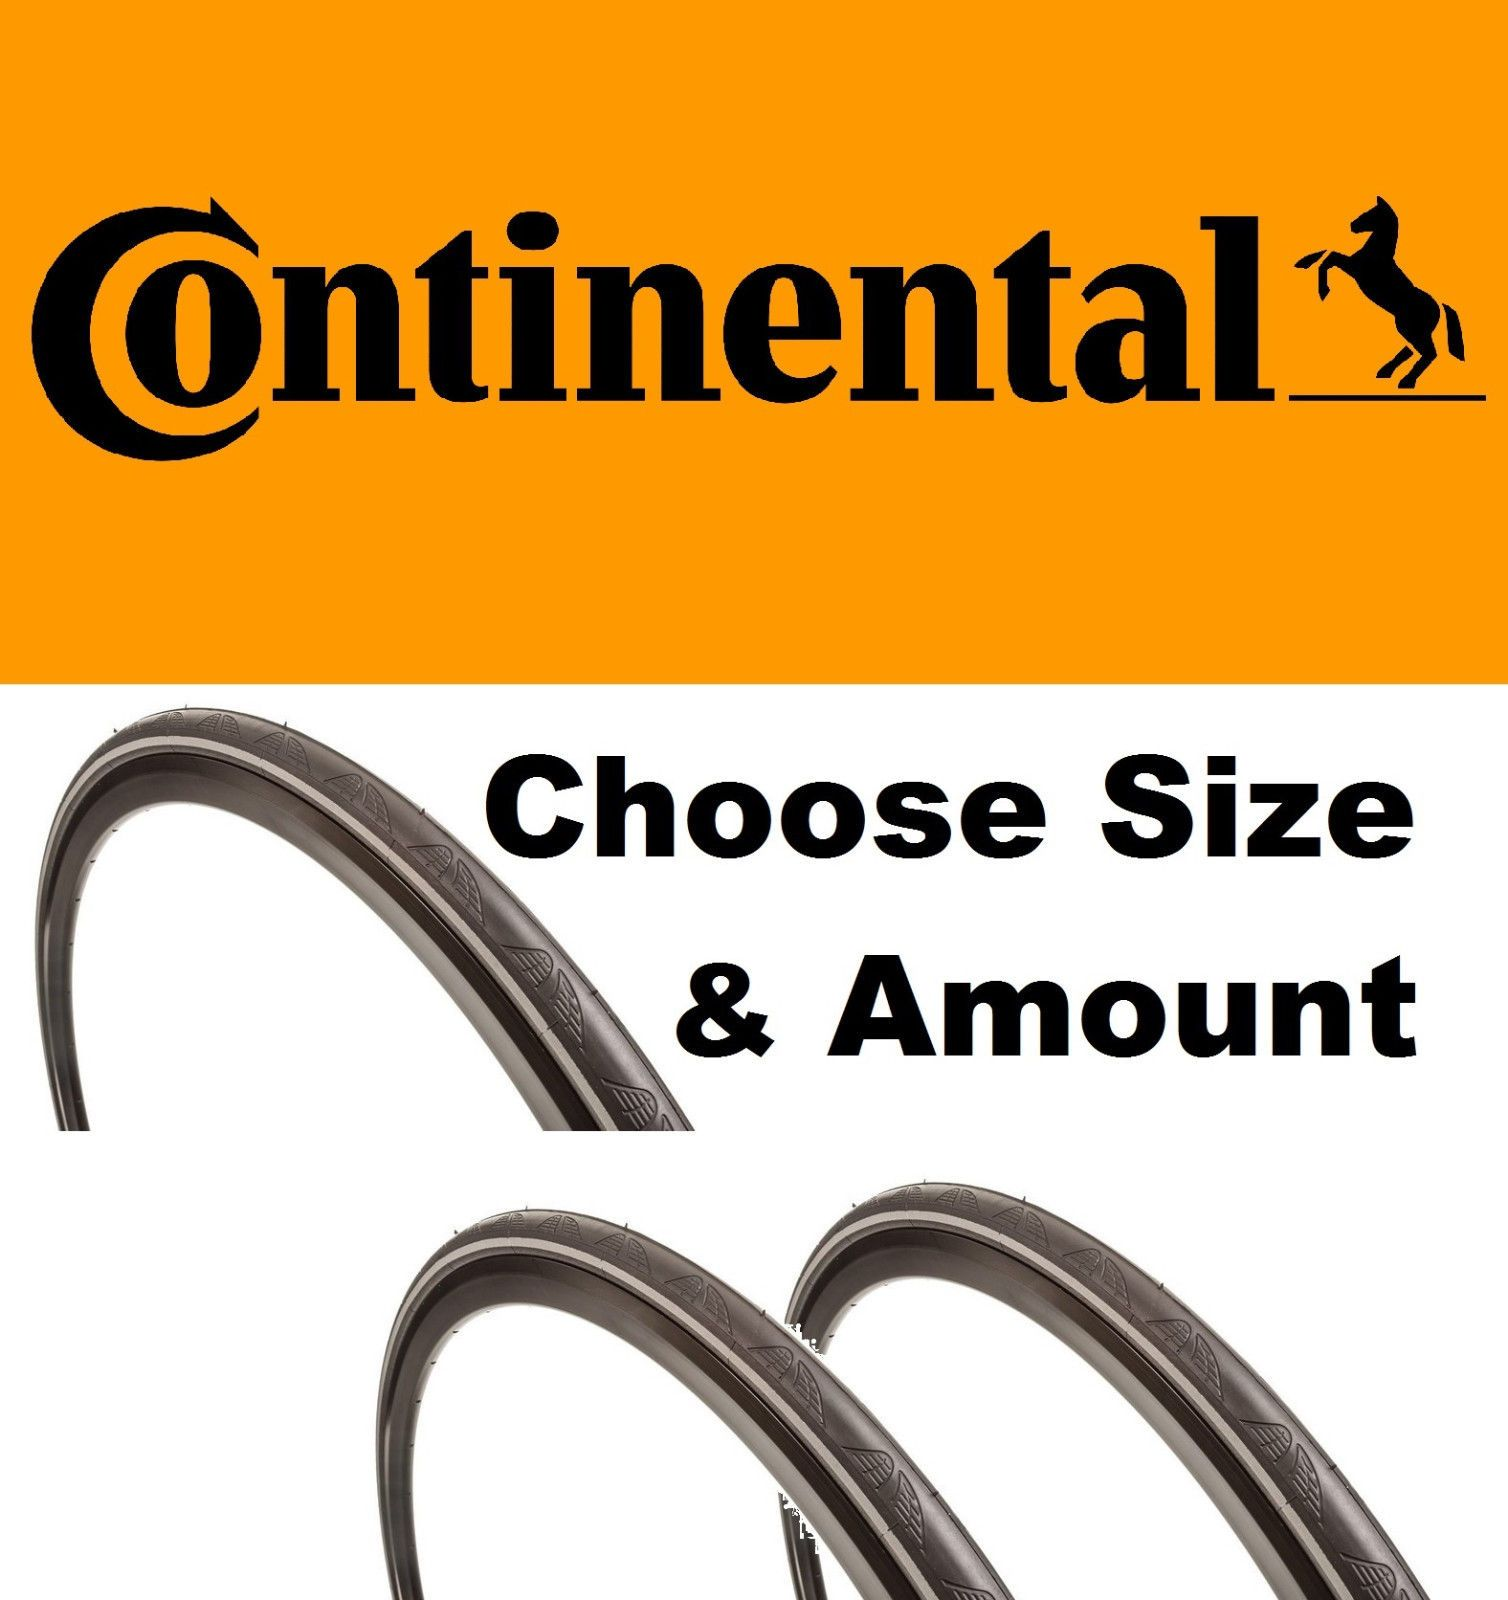 Tires 177828 Continental Grand Prix Gp 4000s Ii Reflex 700x 25c Or Schwalbe Pro One 700 25 C 28c Bike Folding